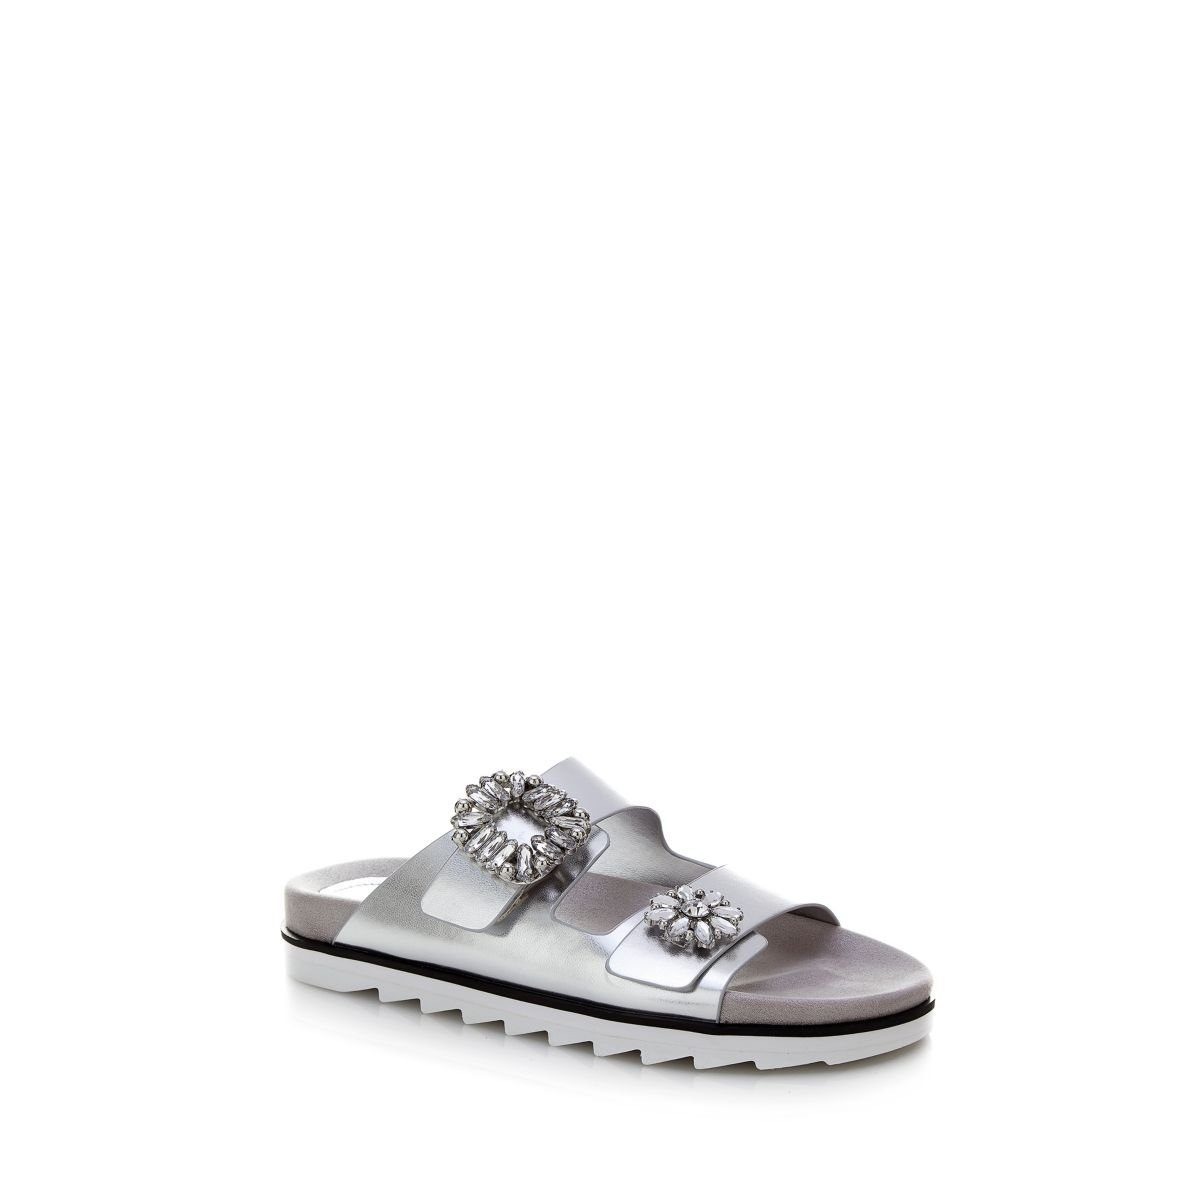 Guess Sandale online kaufen  silberfarben